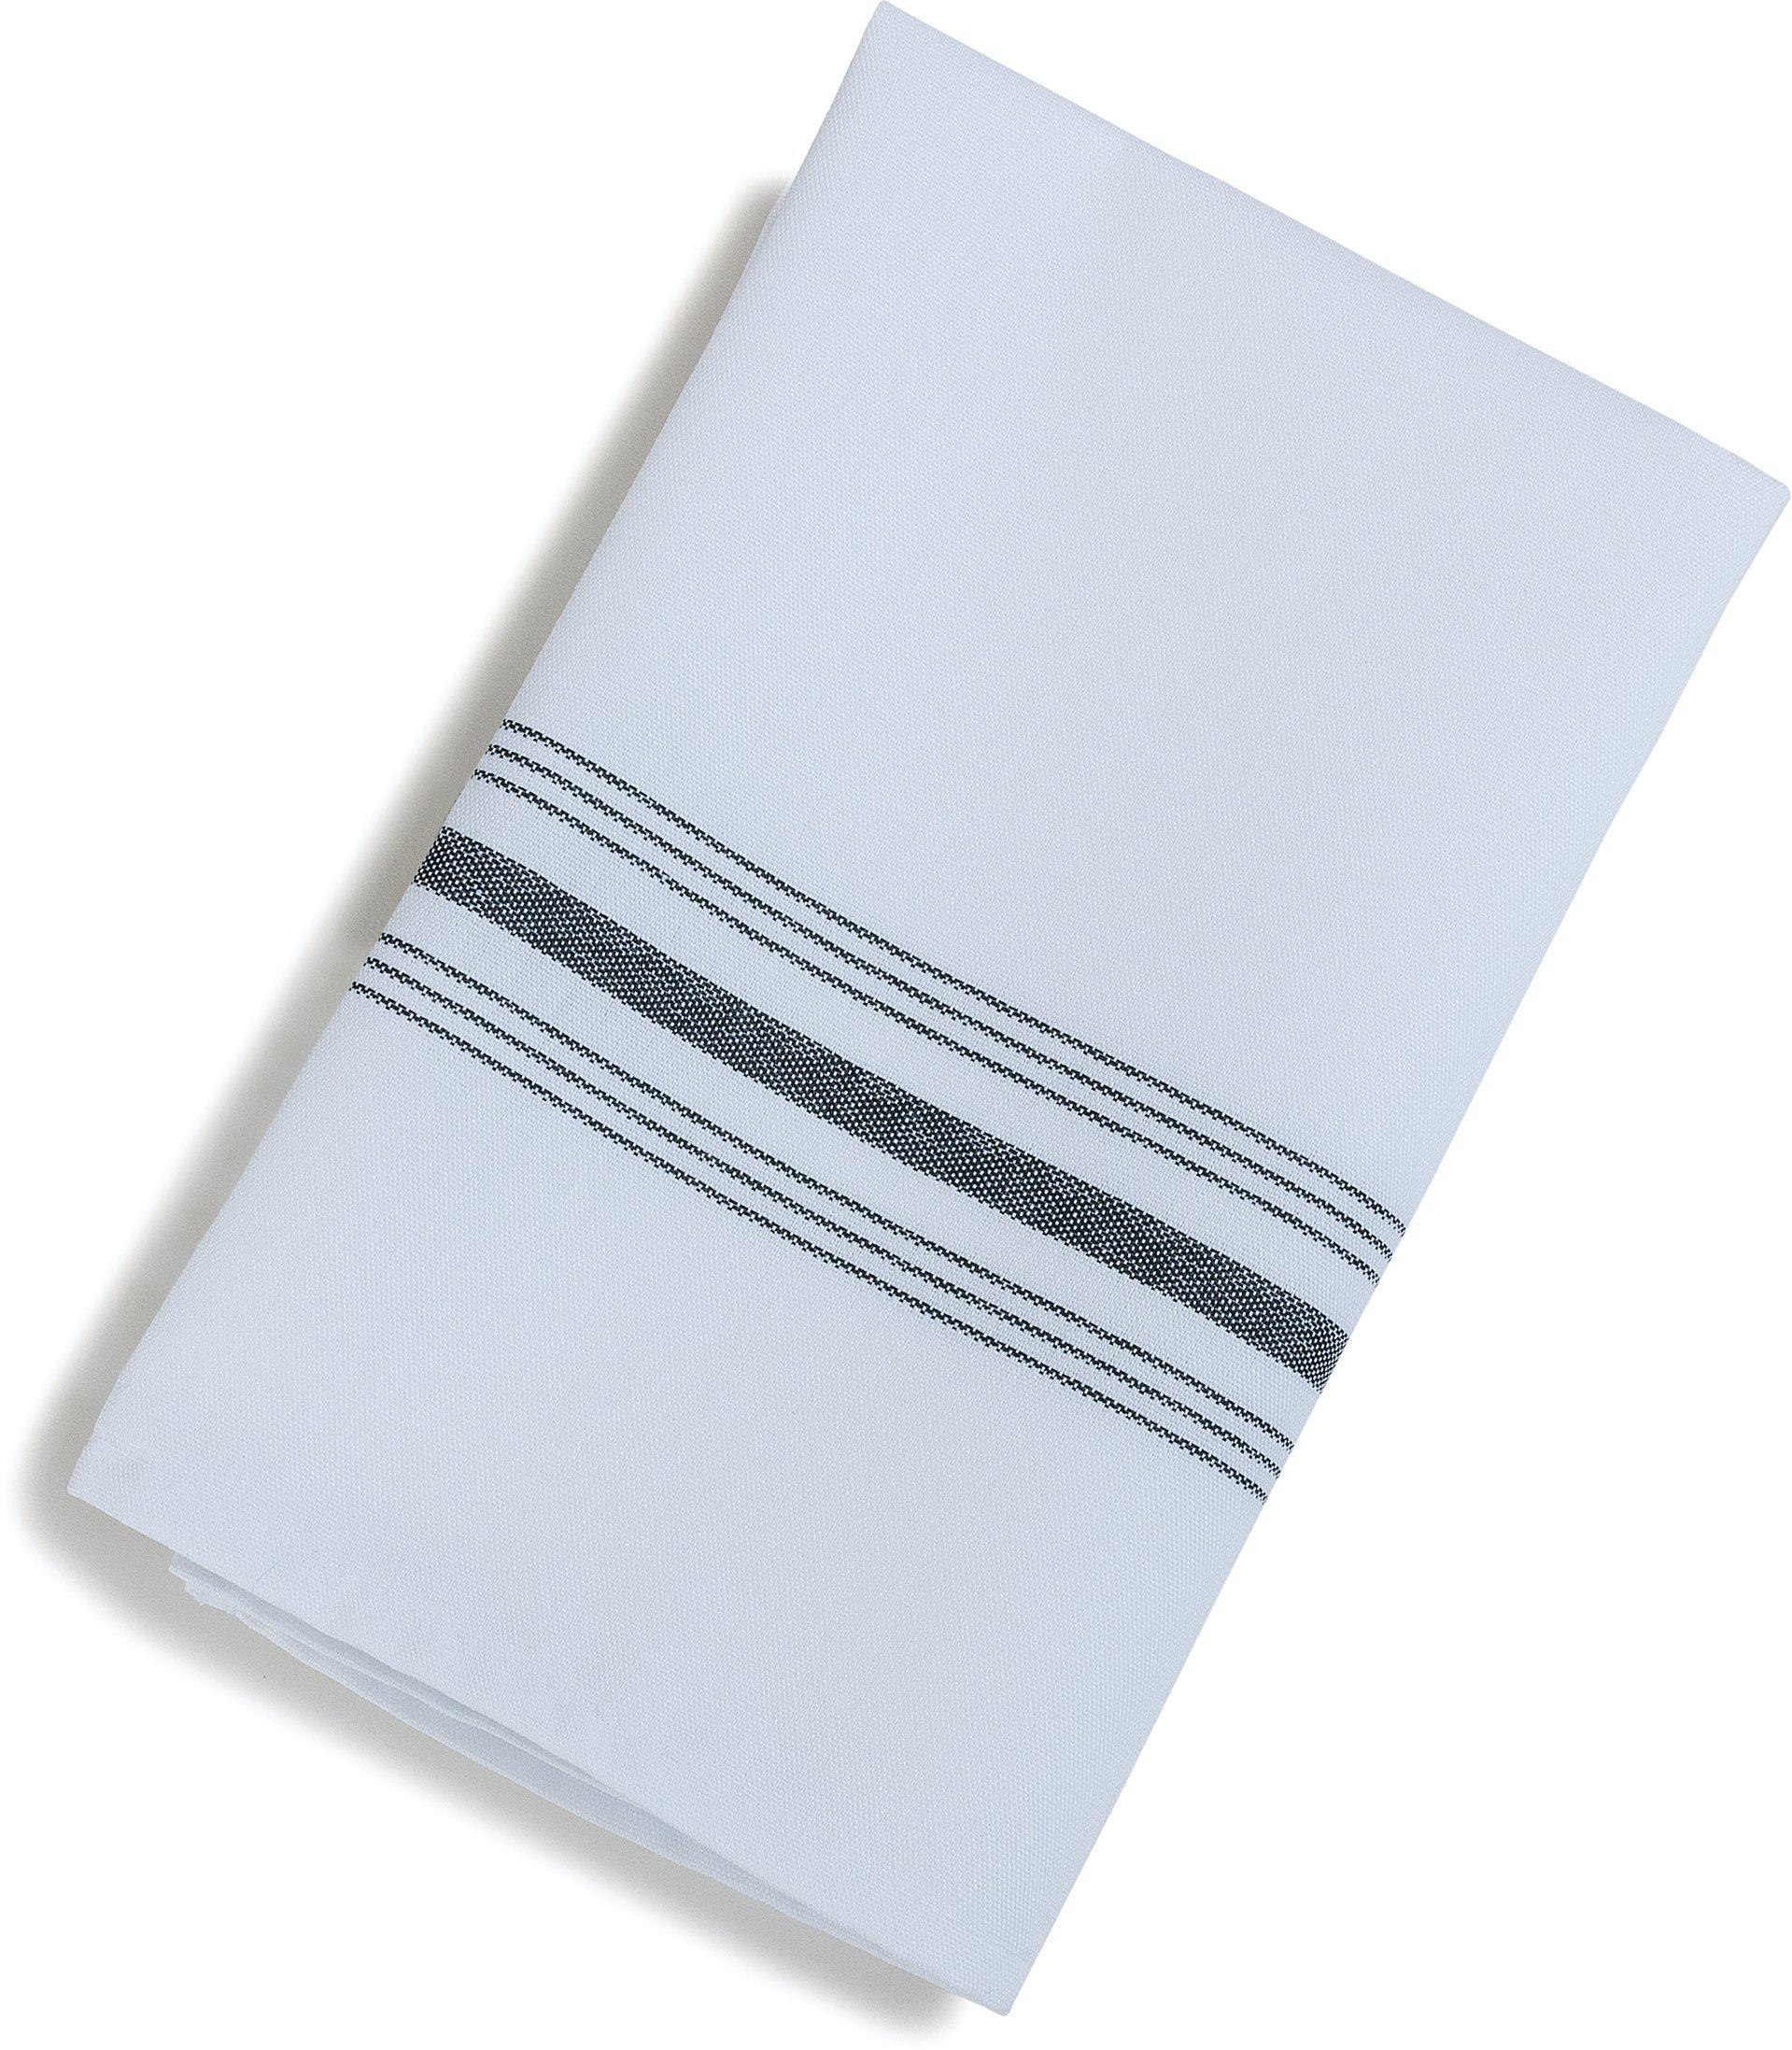 Carlisle 53771822NH014 Restaurant Quality Cloth Dinner/Bistro Napkins, 18'' x 22'', Black Stripe (Pack of 12)